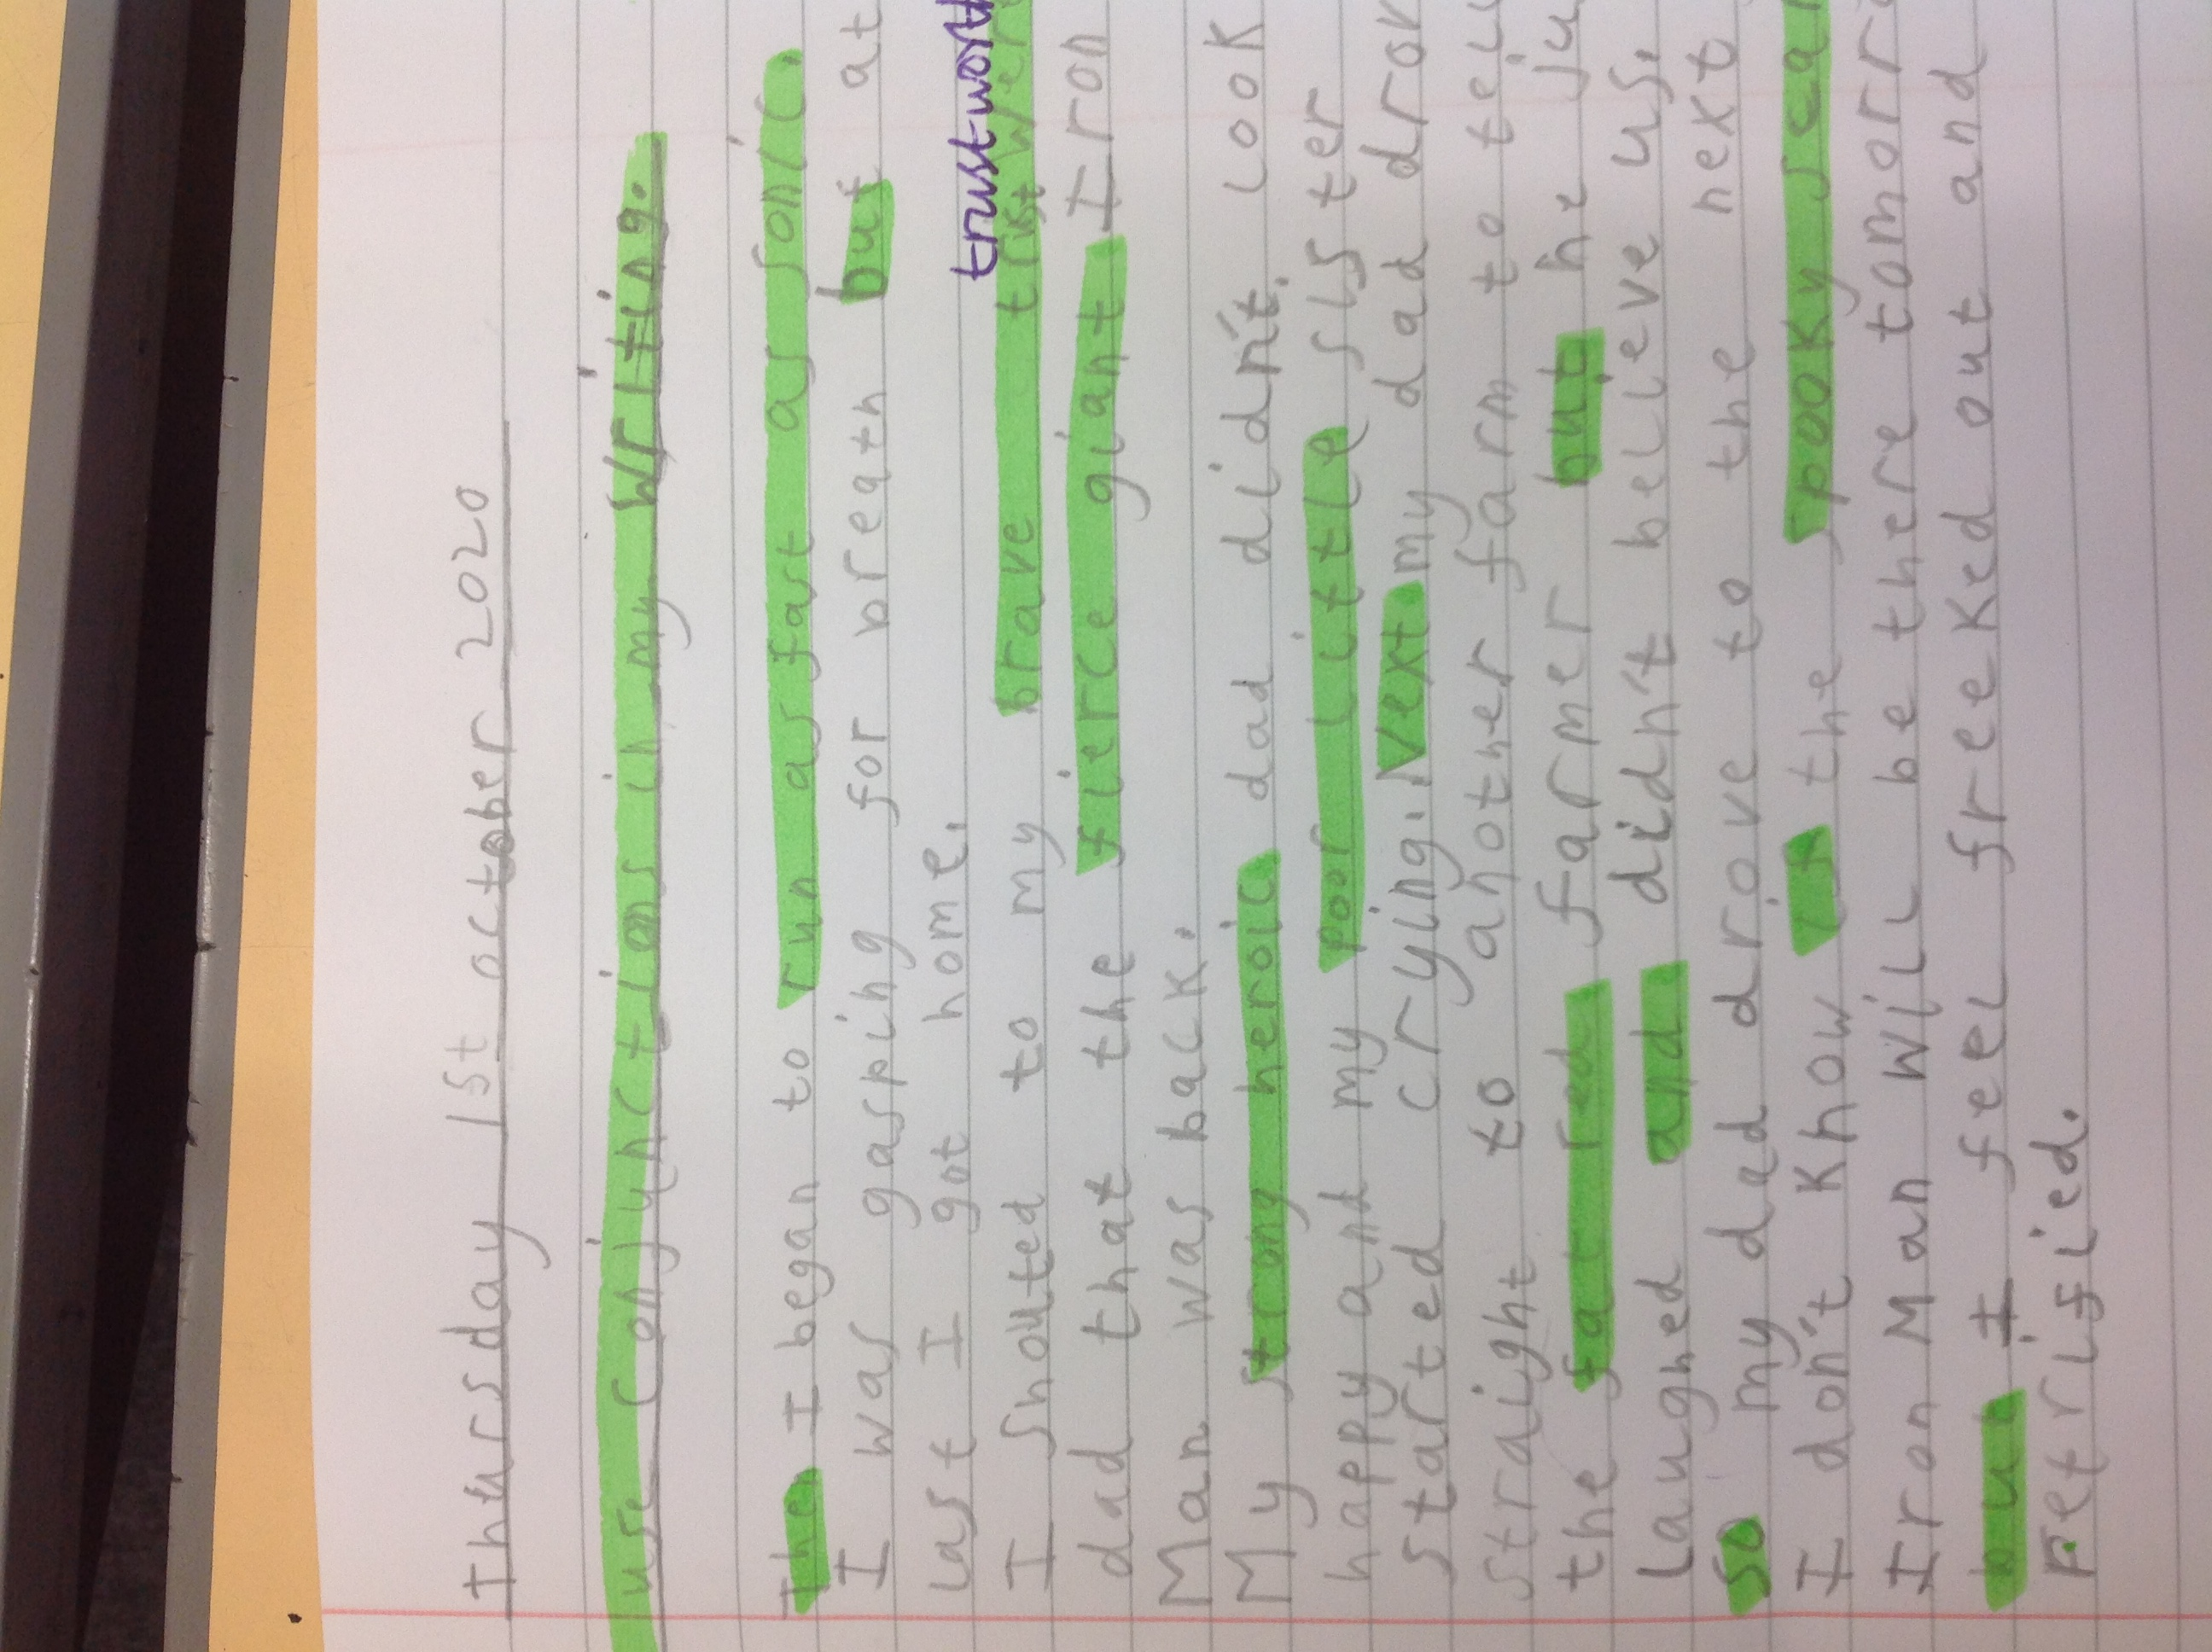 Mundhir's wonderful writing!